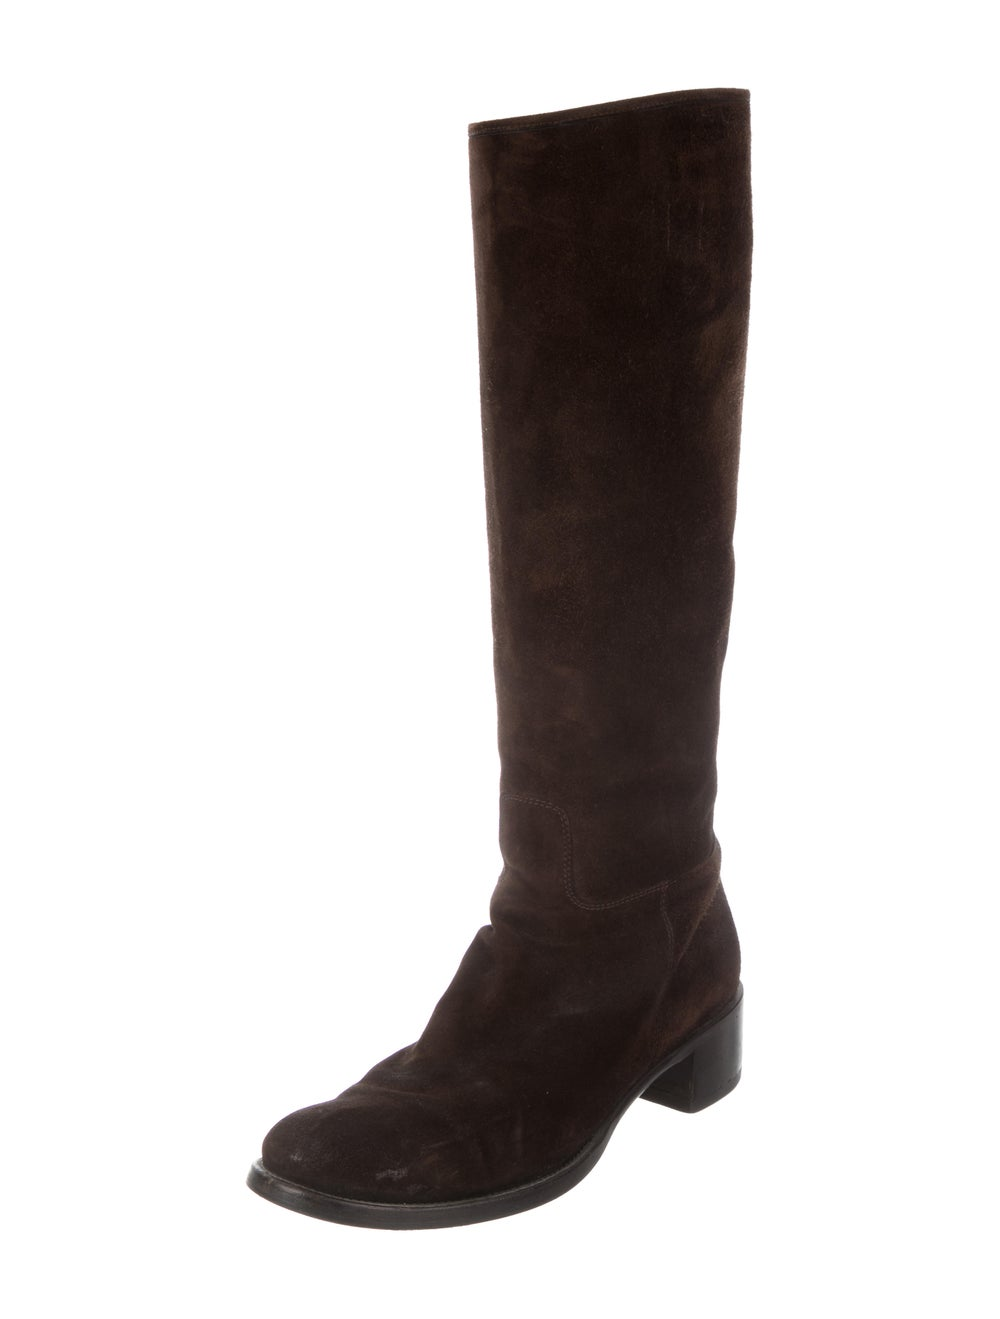 Prada Suede Knee-High Boots Brown - image 2